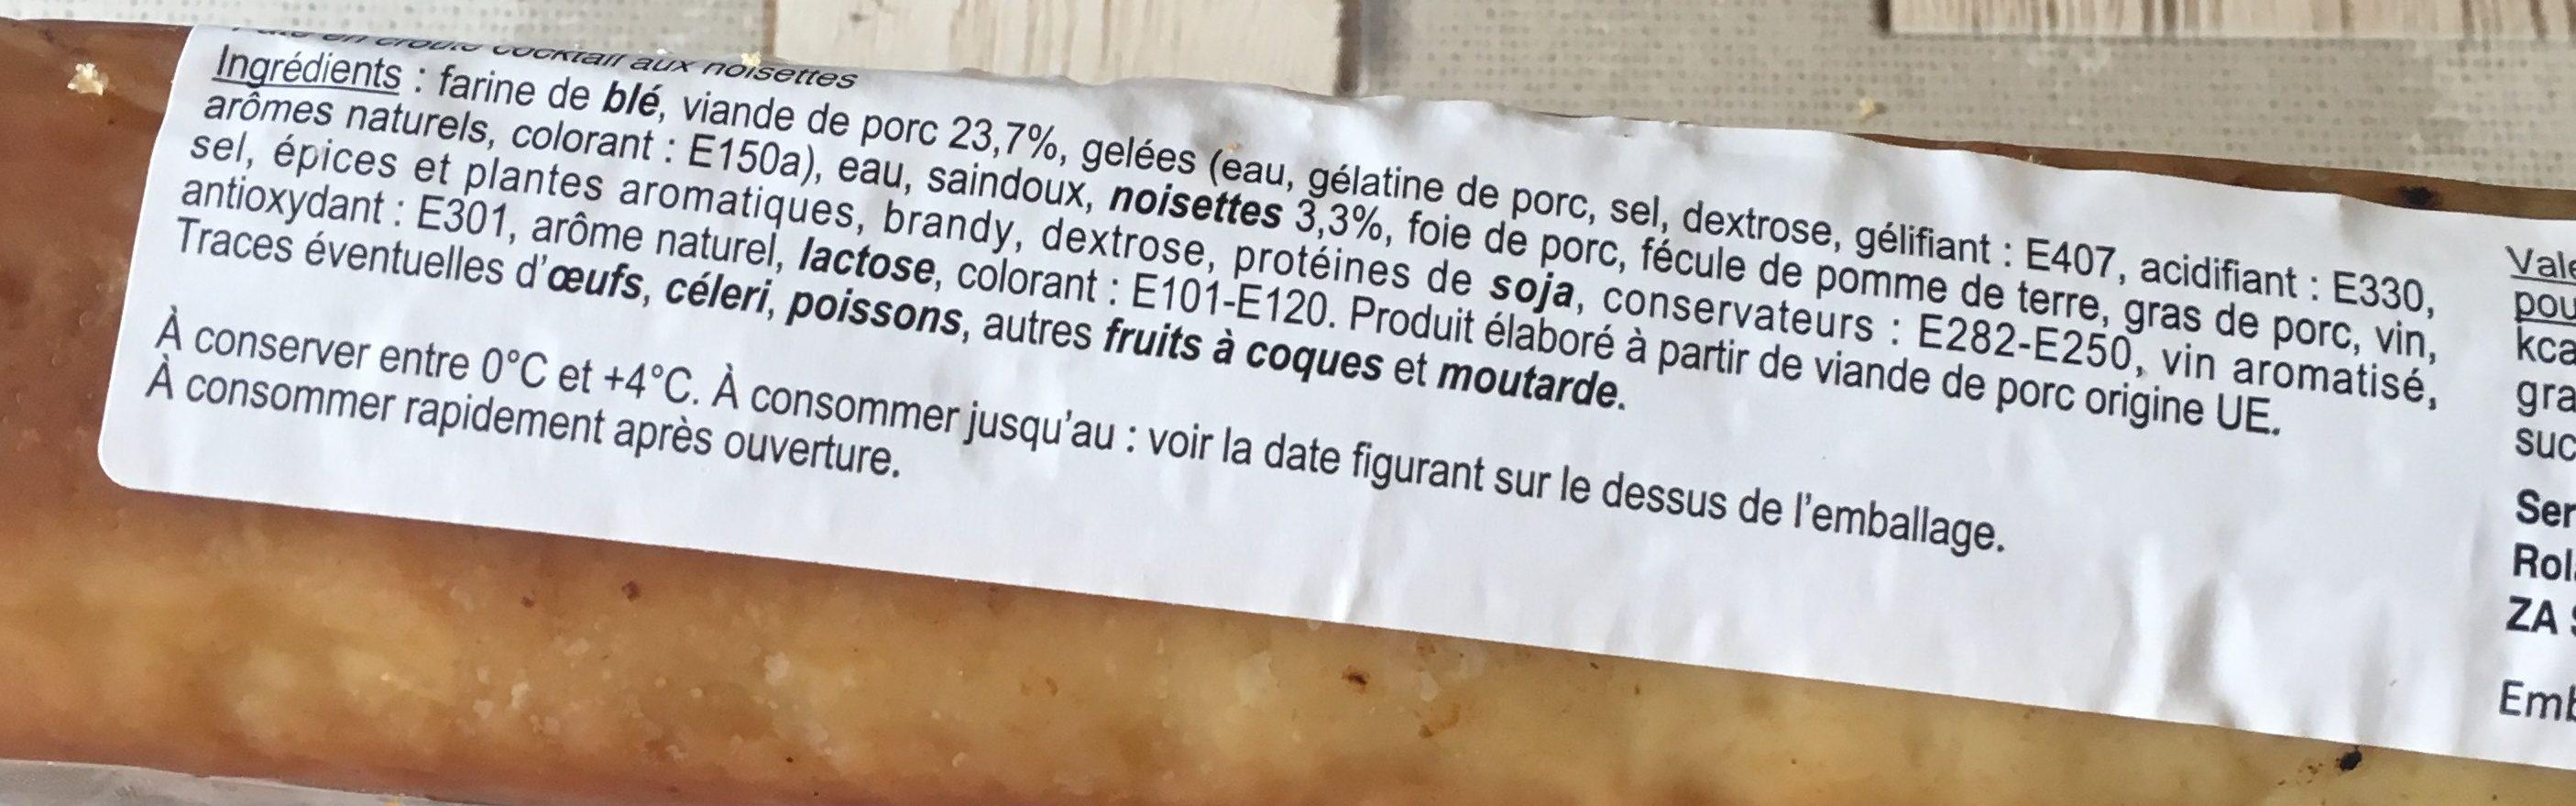 Paté en croûte - Ingrediënten